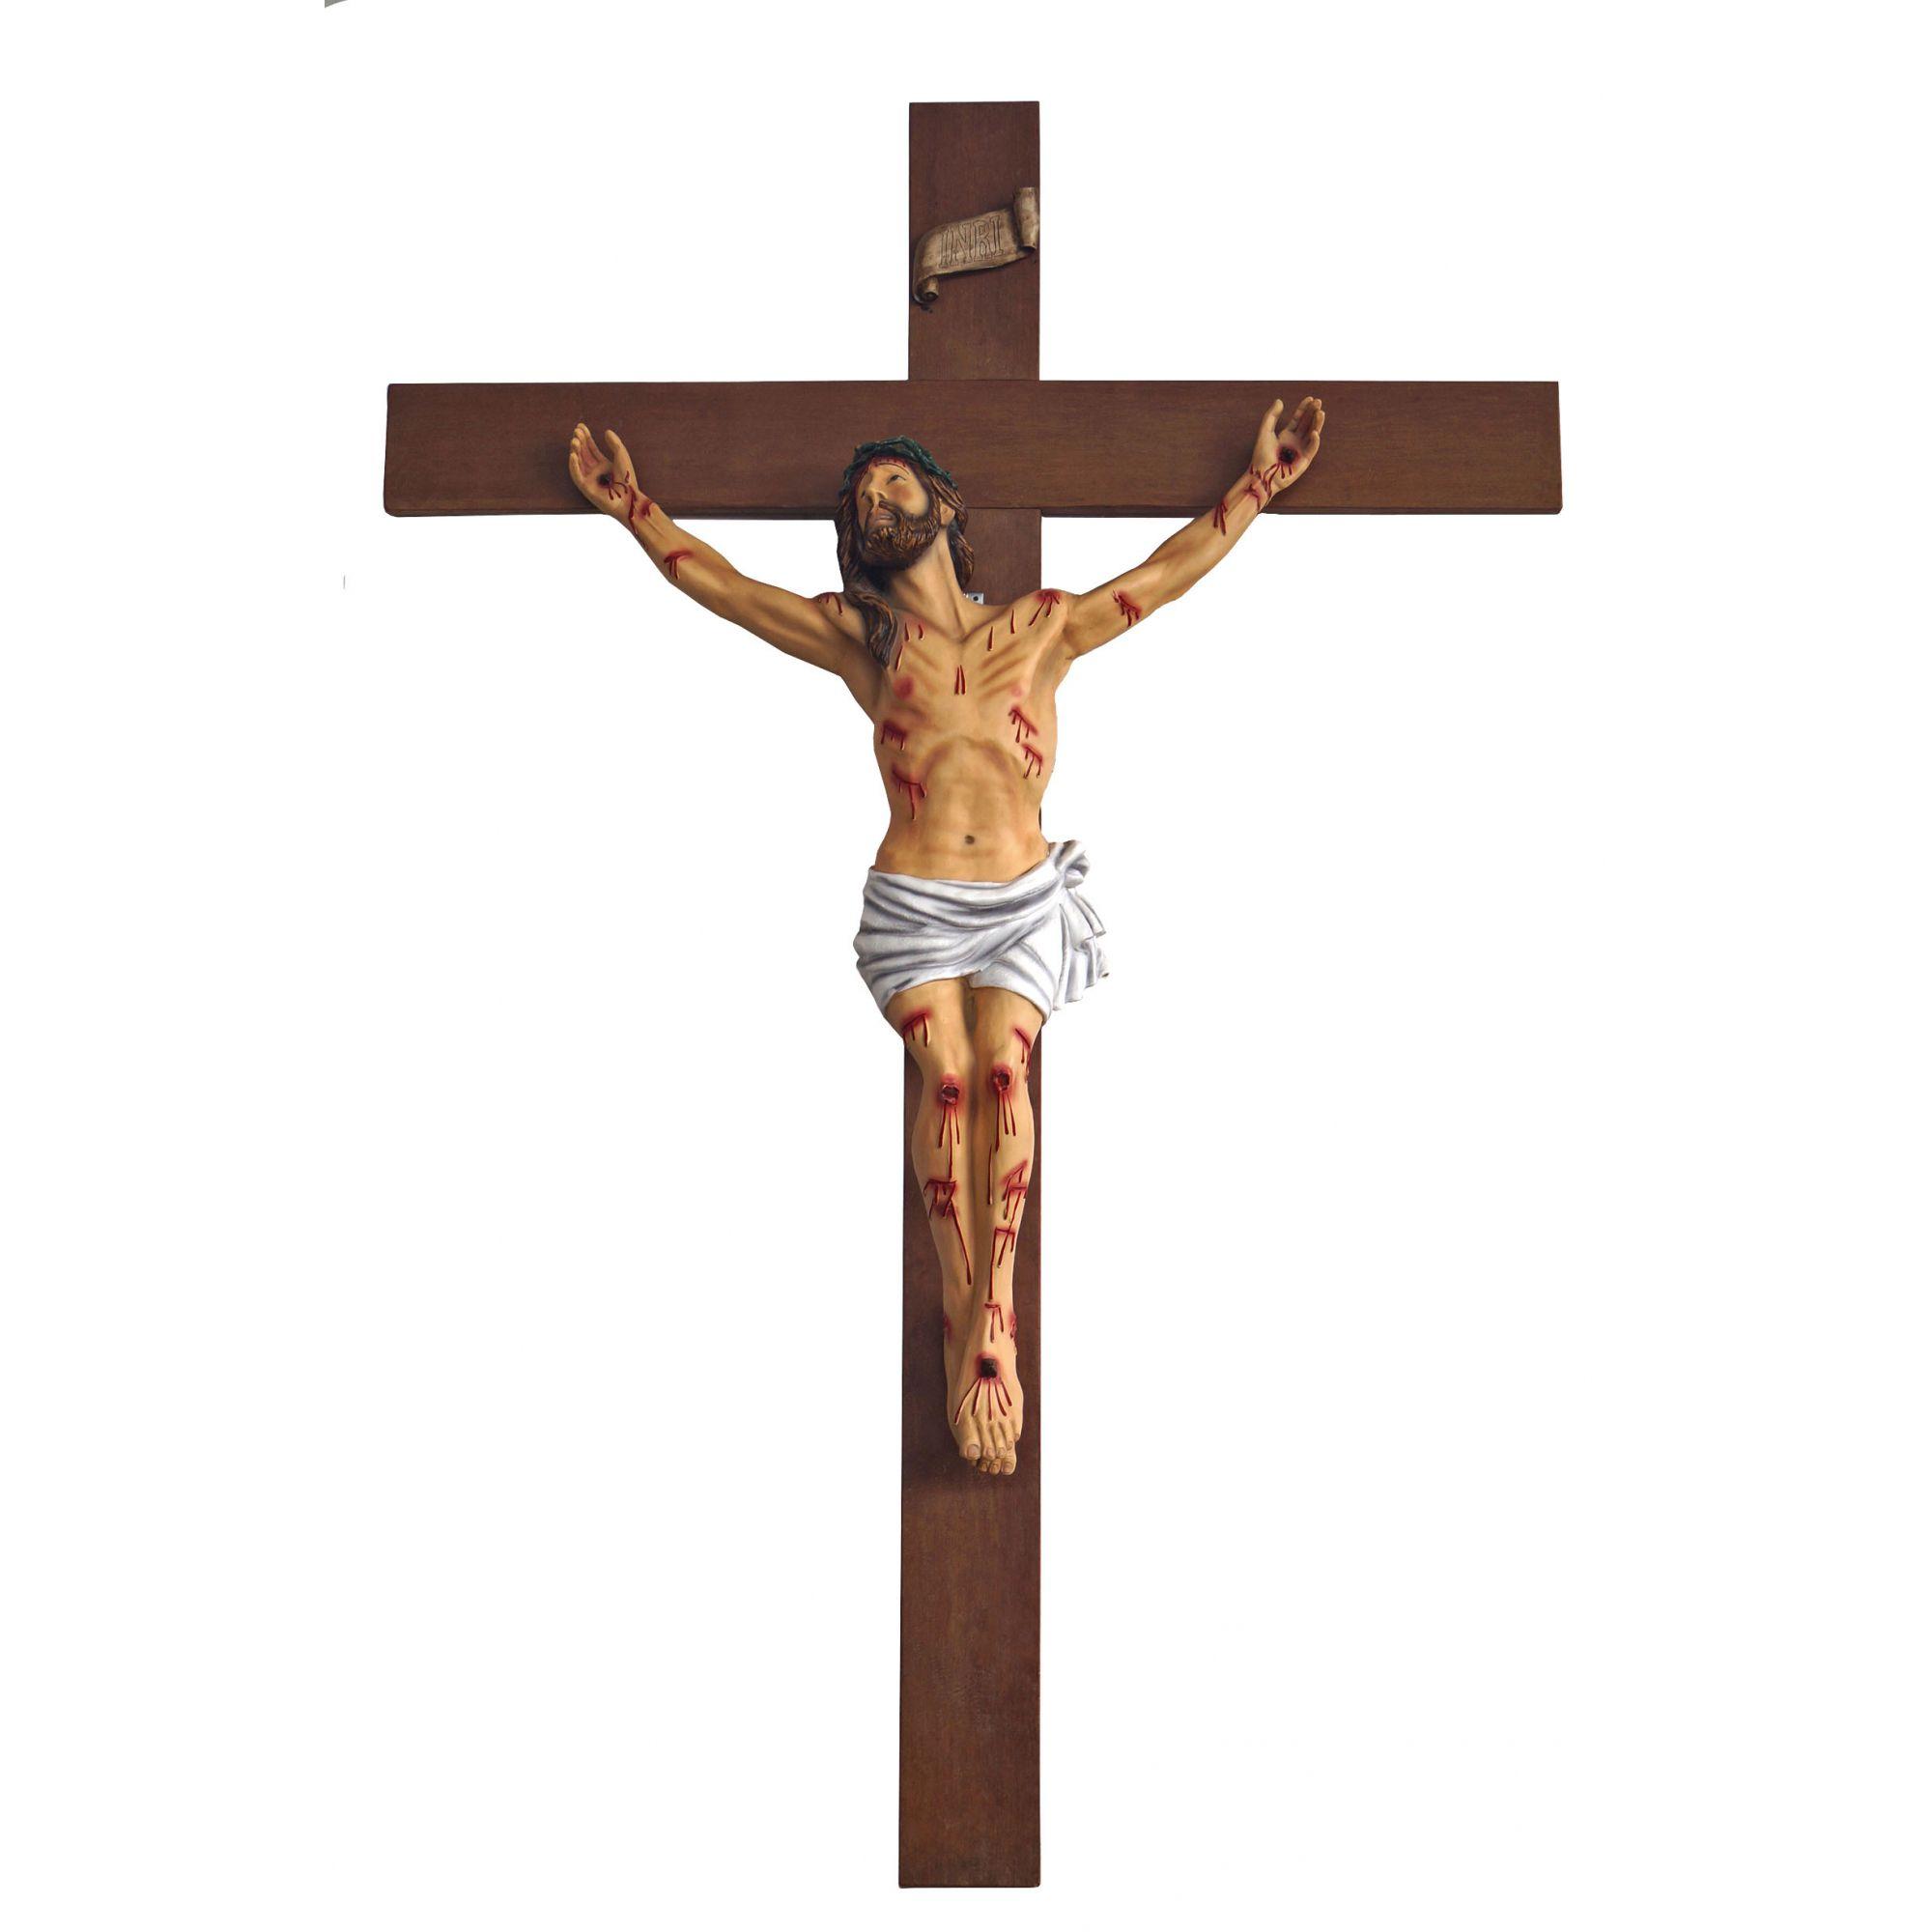 Crucifixo: 250 cm | Corpo: 140 cm (agonia)